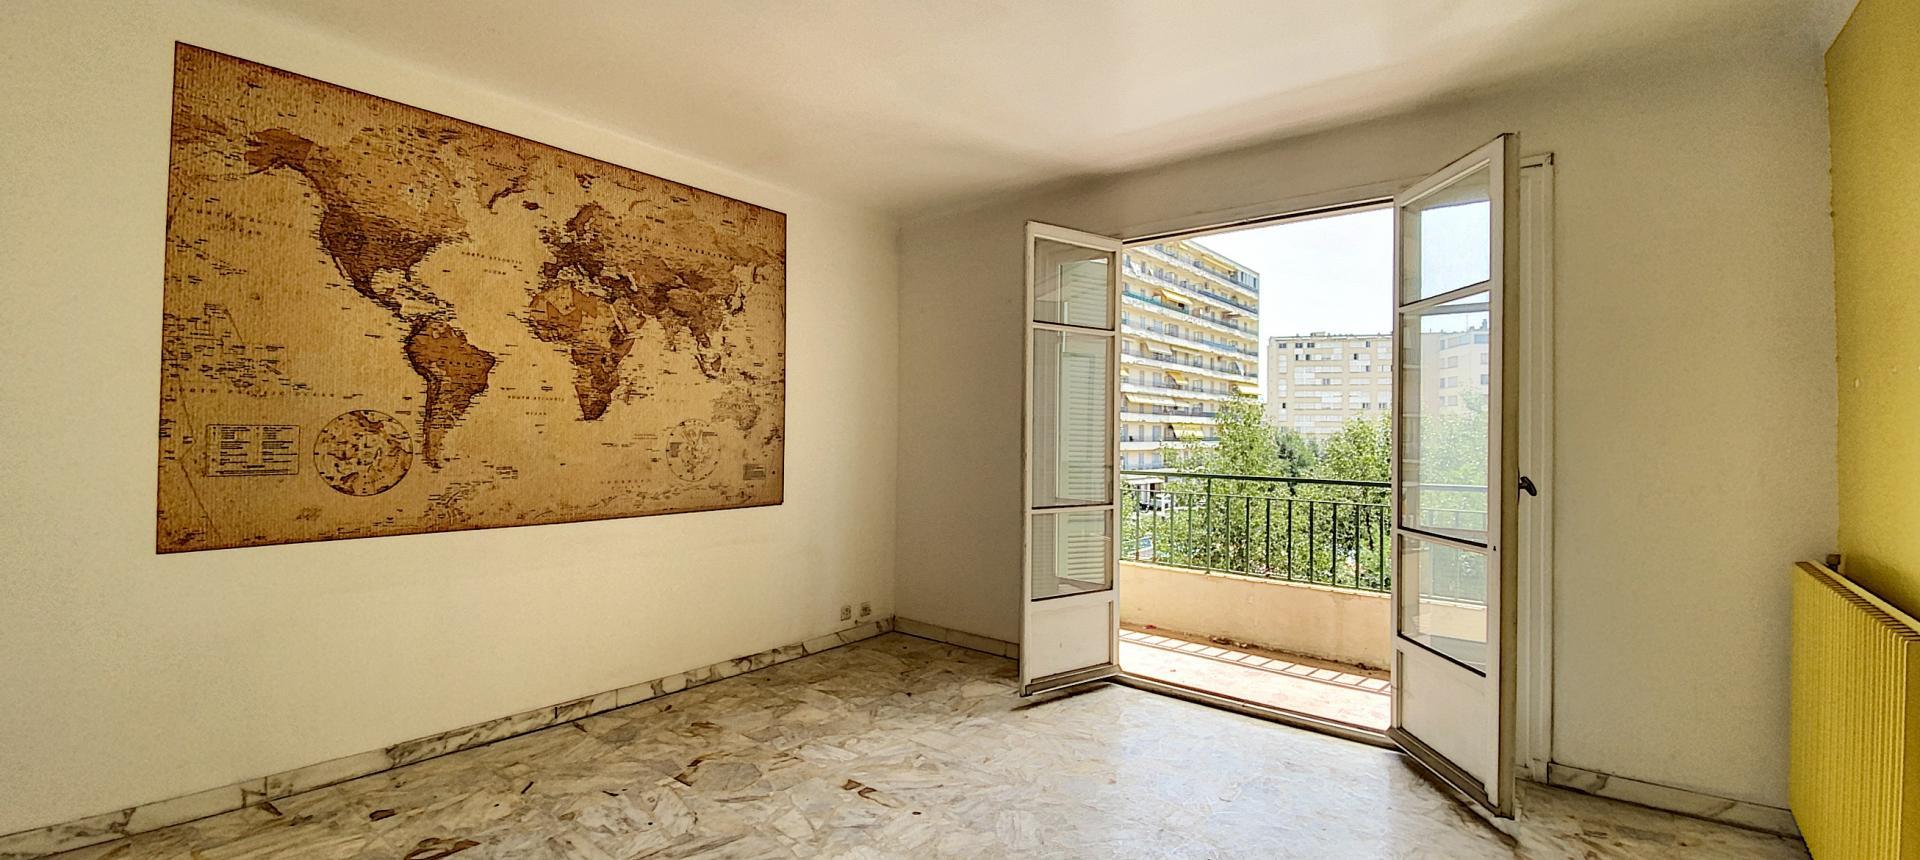 A vendre appartement F3 proche centre-ville - Vue salon 2